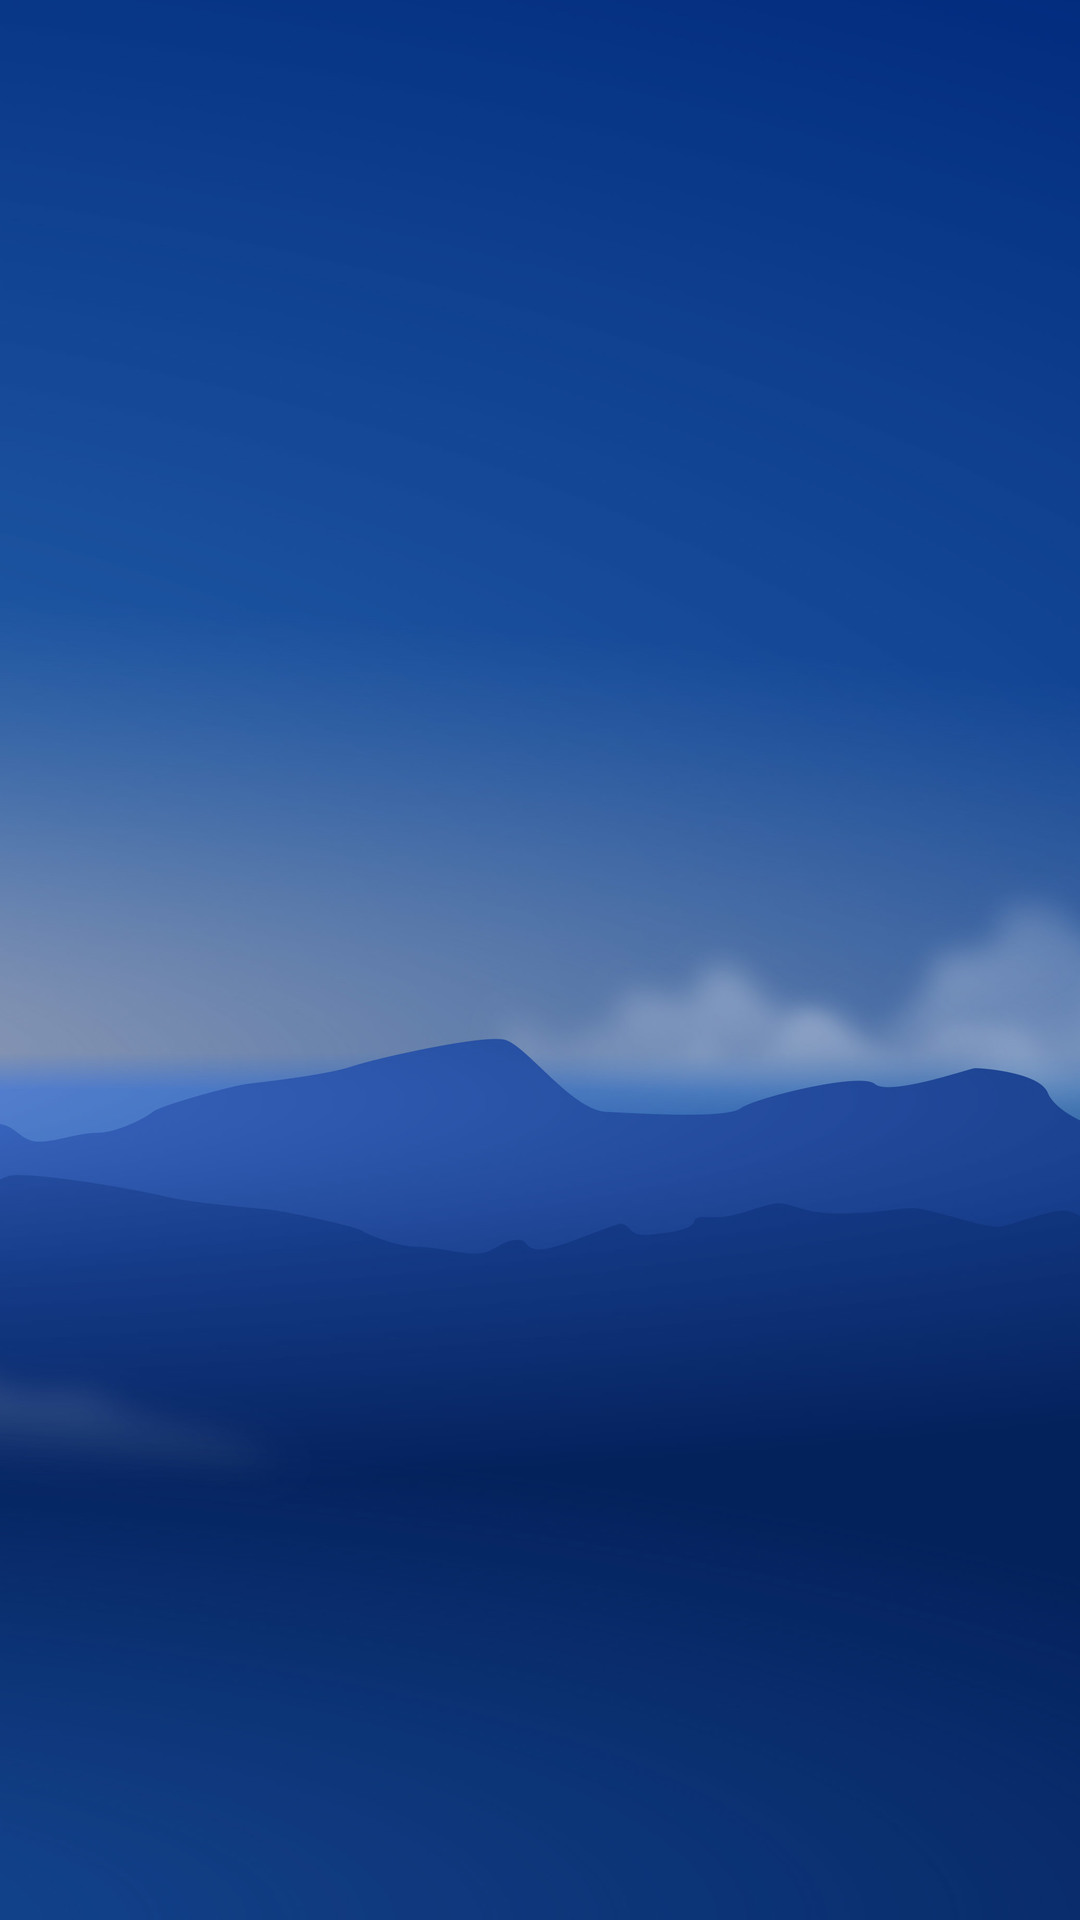 Most Inspiring Wallpaper Mountain Asus - Mountains-Minimalism-L2-Wallpaper-1080x1920  You Should Have_183665.jpg